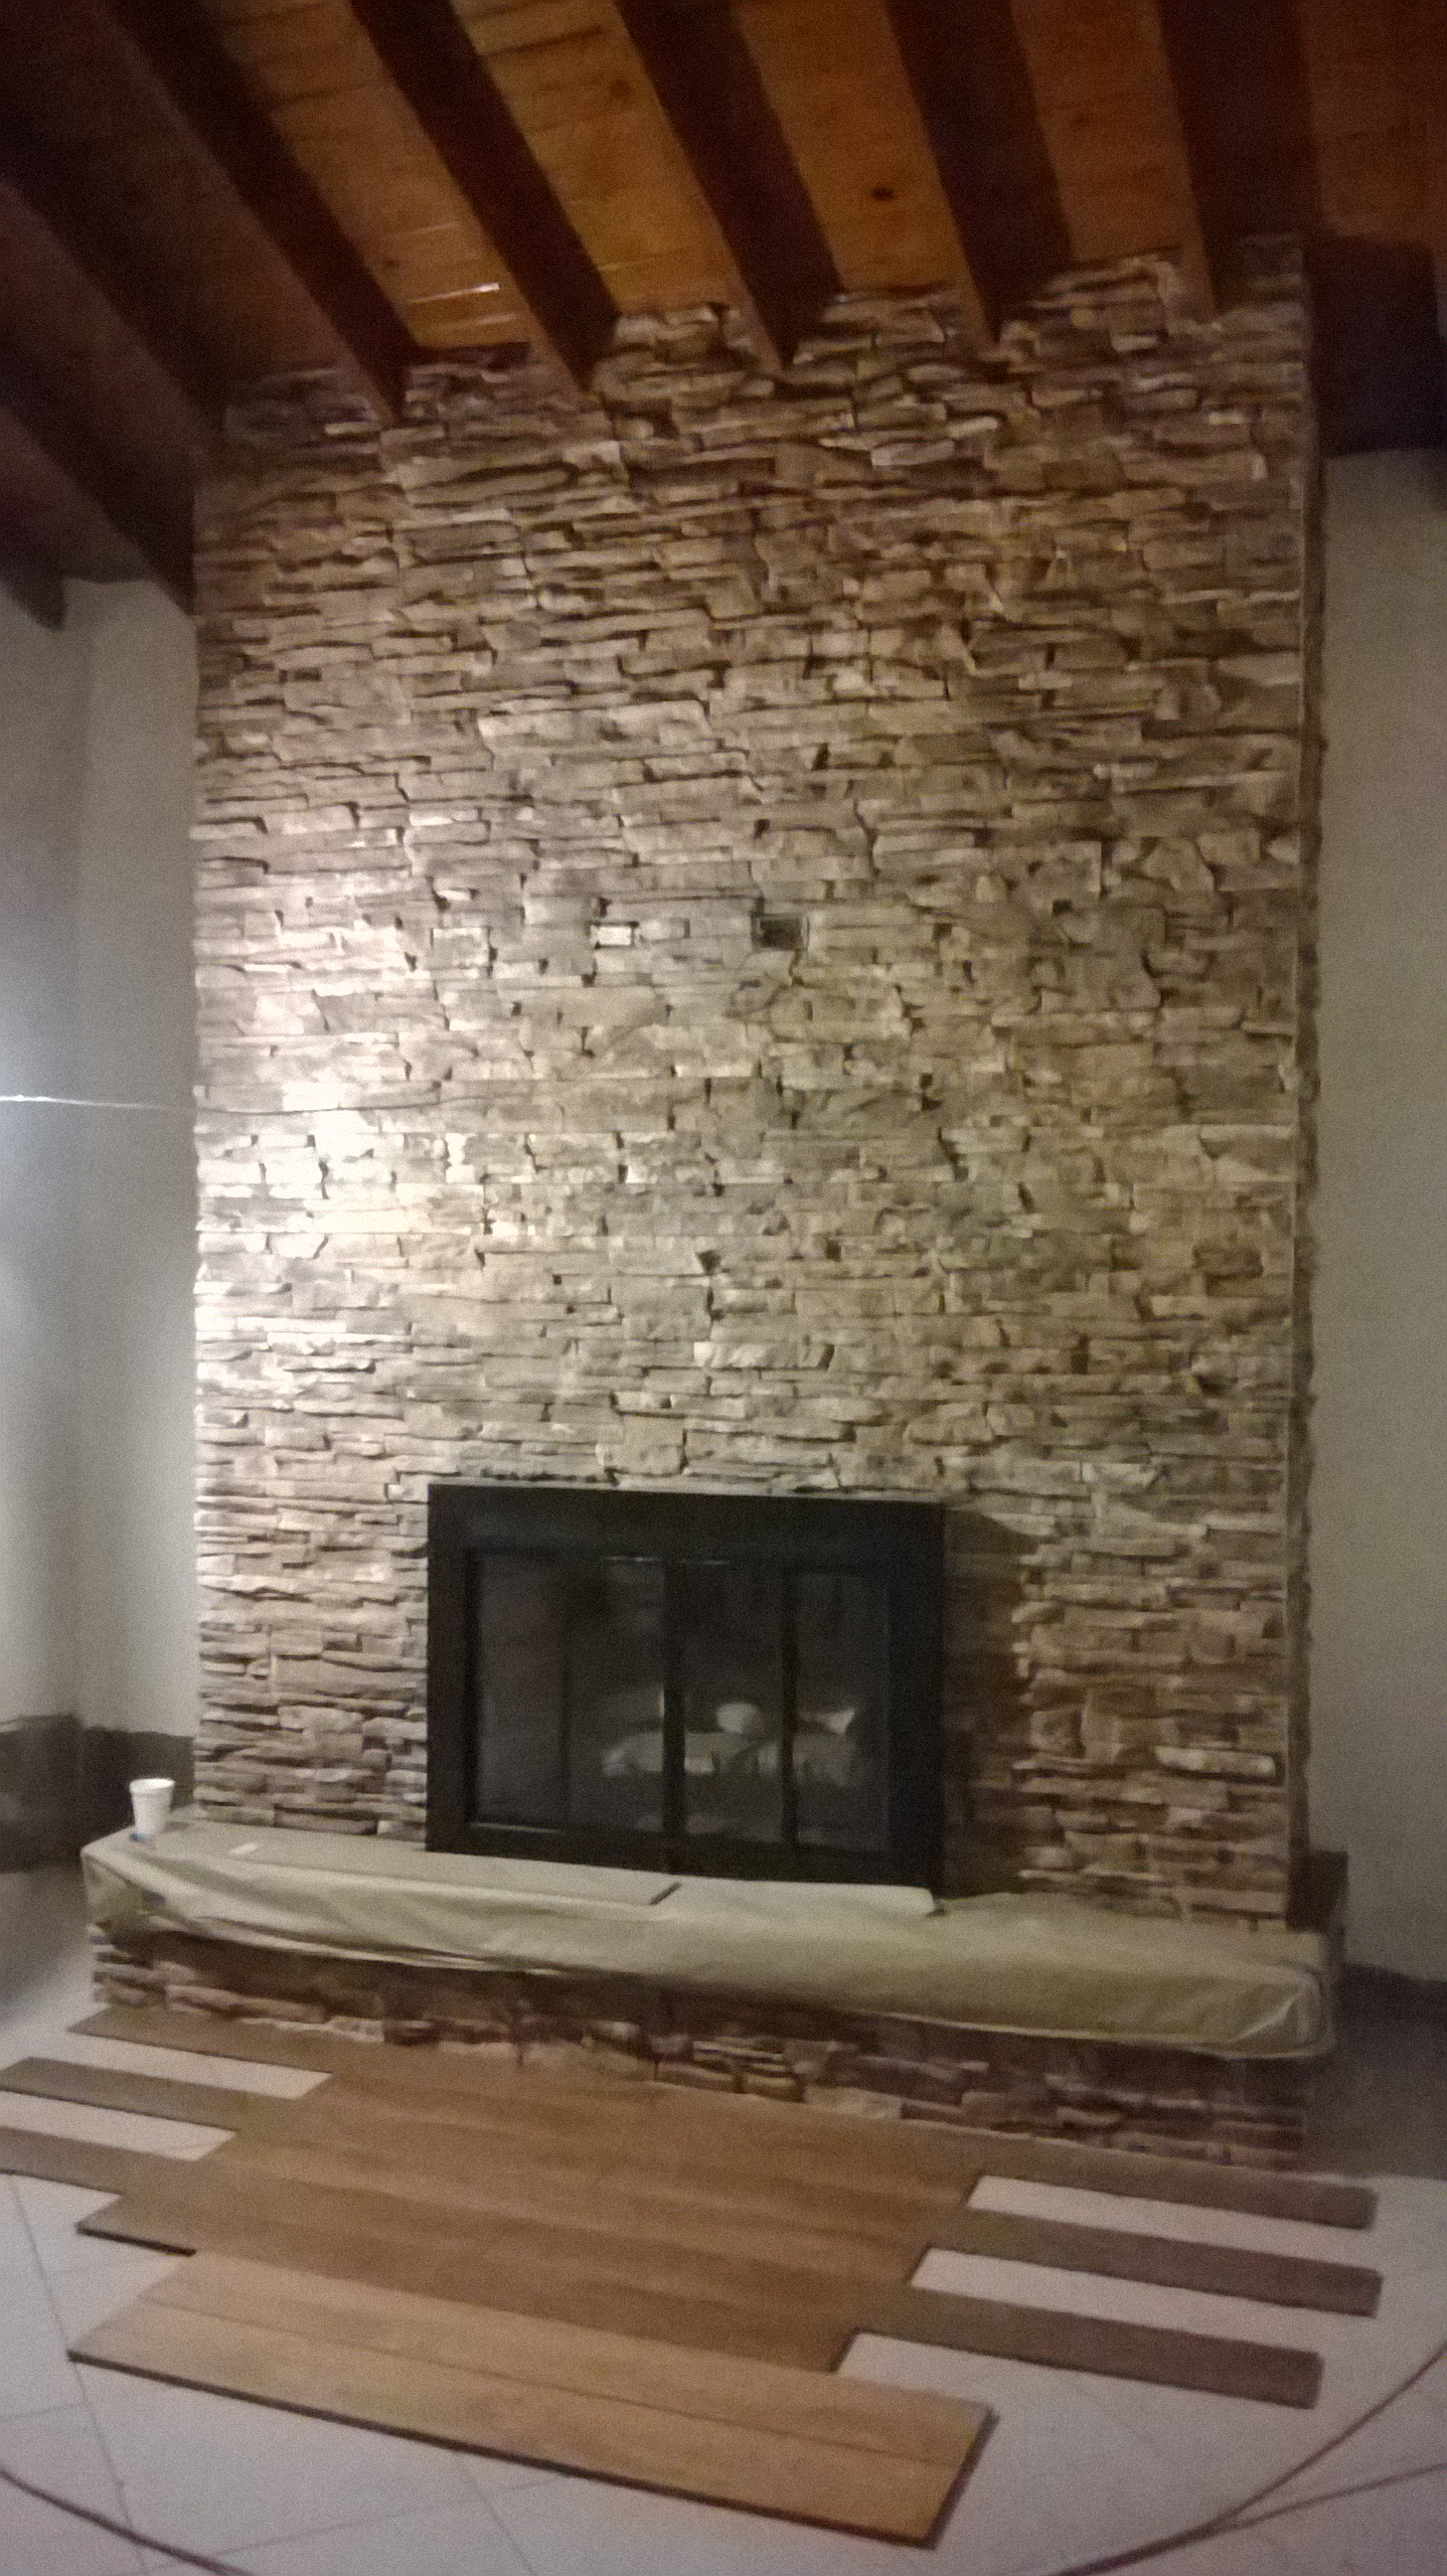 Chimenea de piedra gas y lena 2500 dlls chimeneas baja - Revestimientos para chimeneas de lena ...